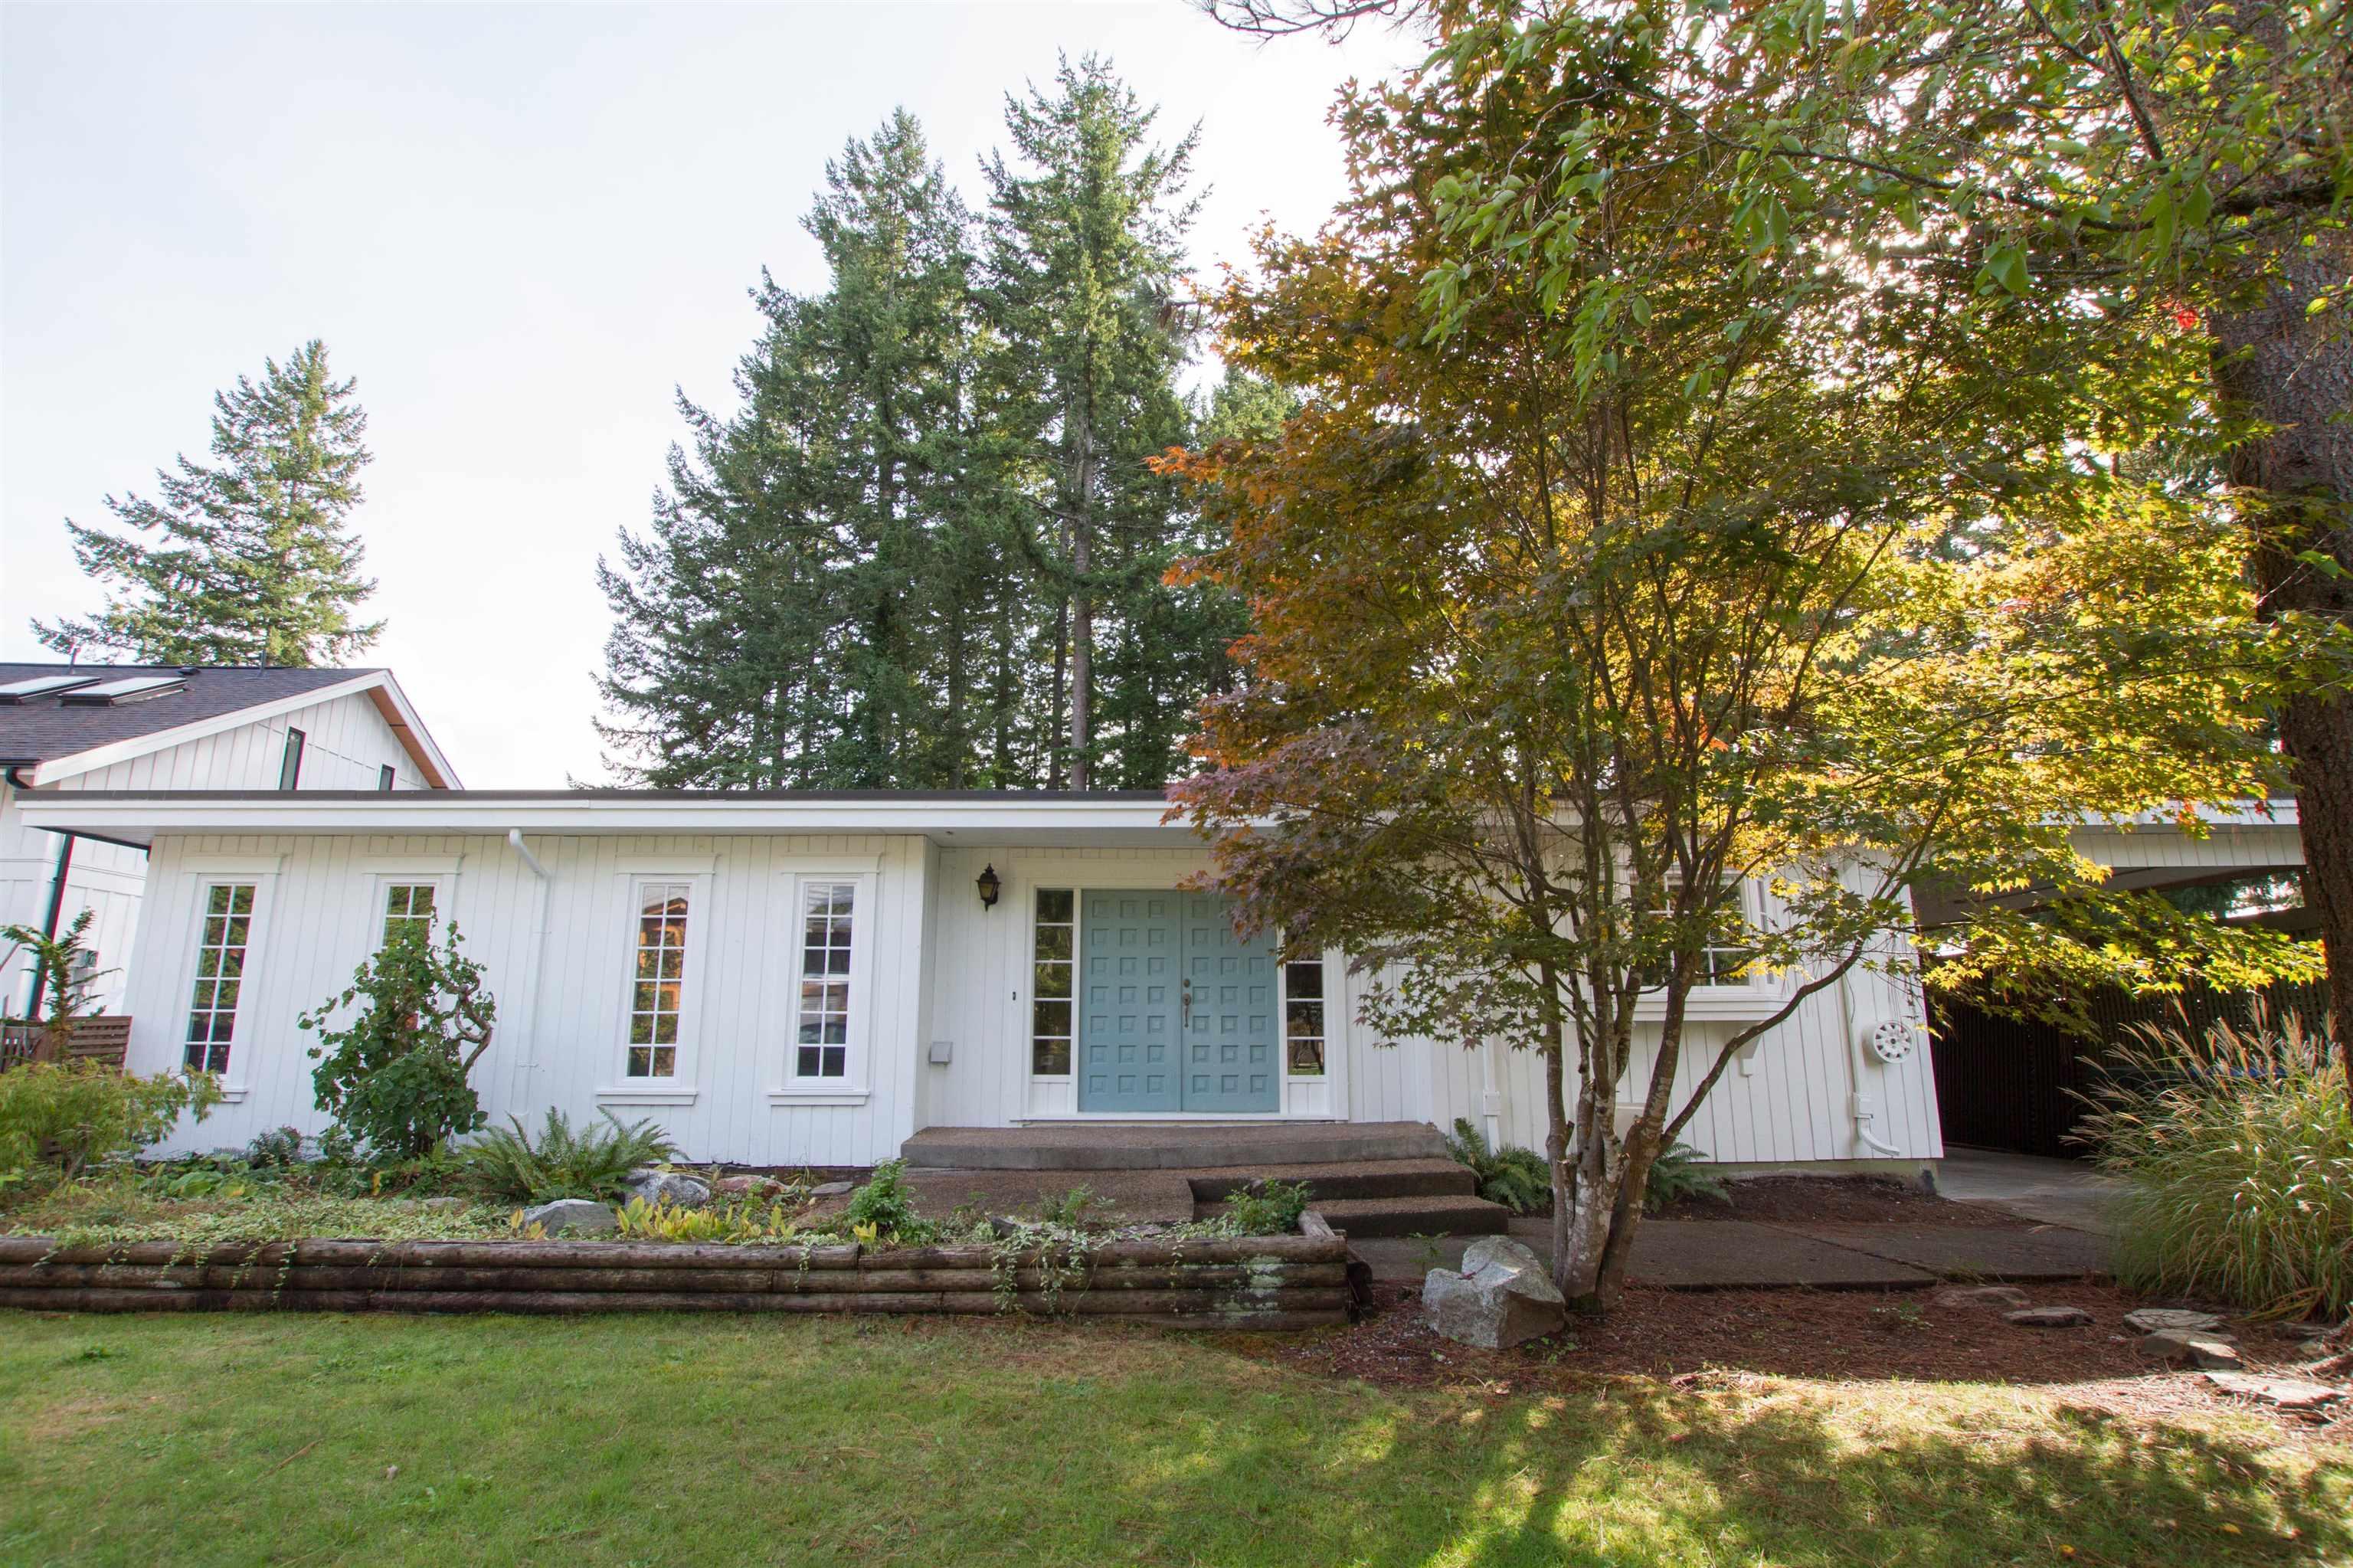 40216 KINTYRE DRIVE - Garibaldi Highlands House/Single Family for sale, 3 Bedrooms (R2623133)